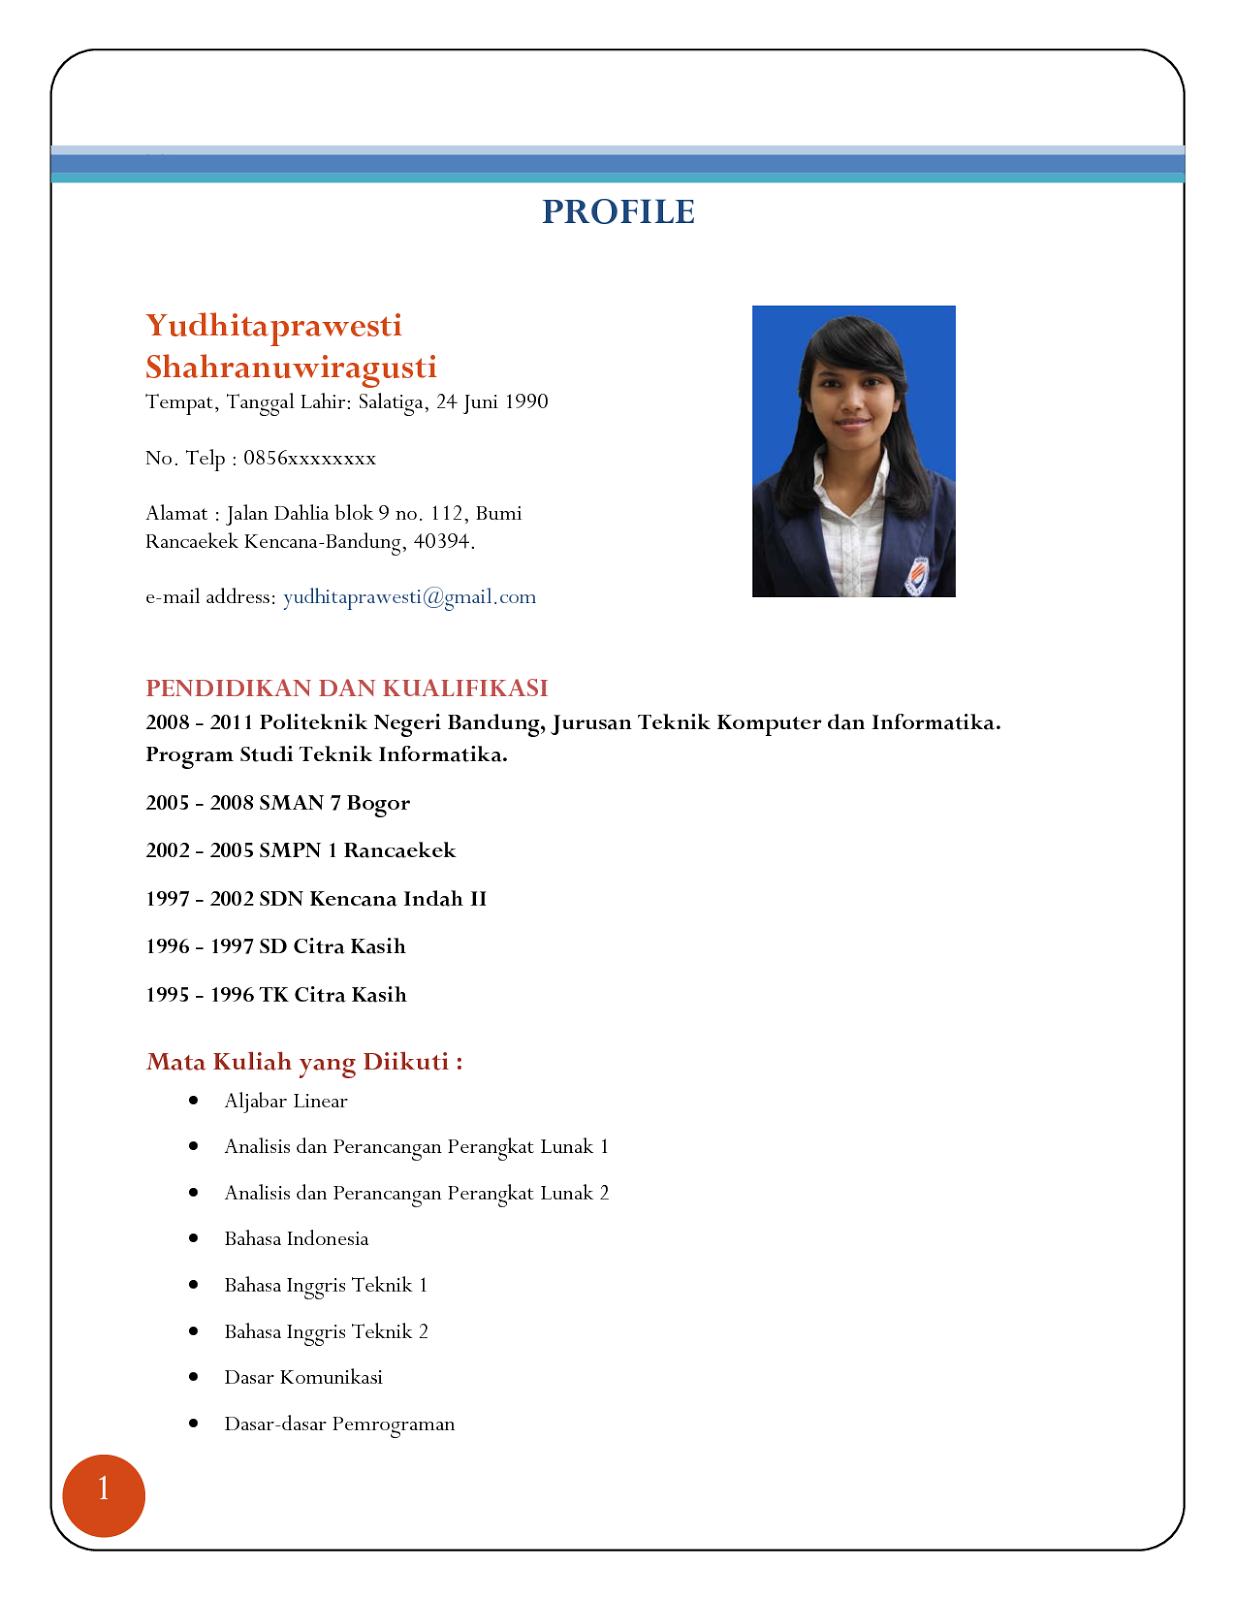 Cv Accounting Dalam Bahasa Inggris Resume Examples For